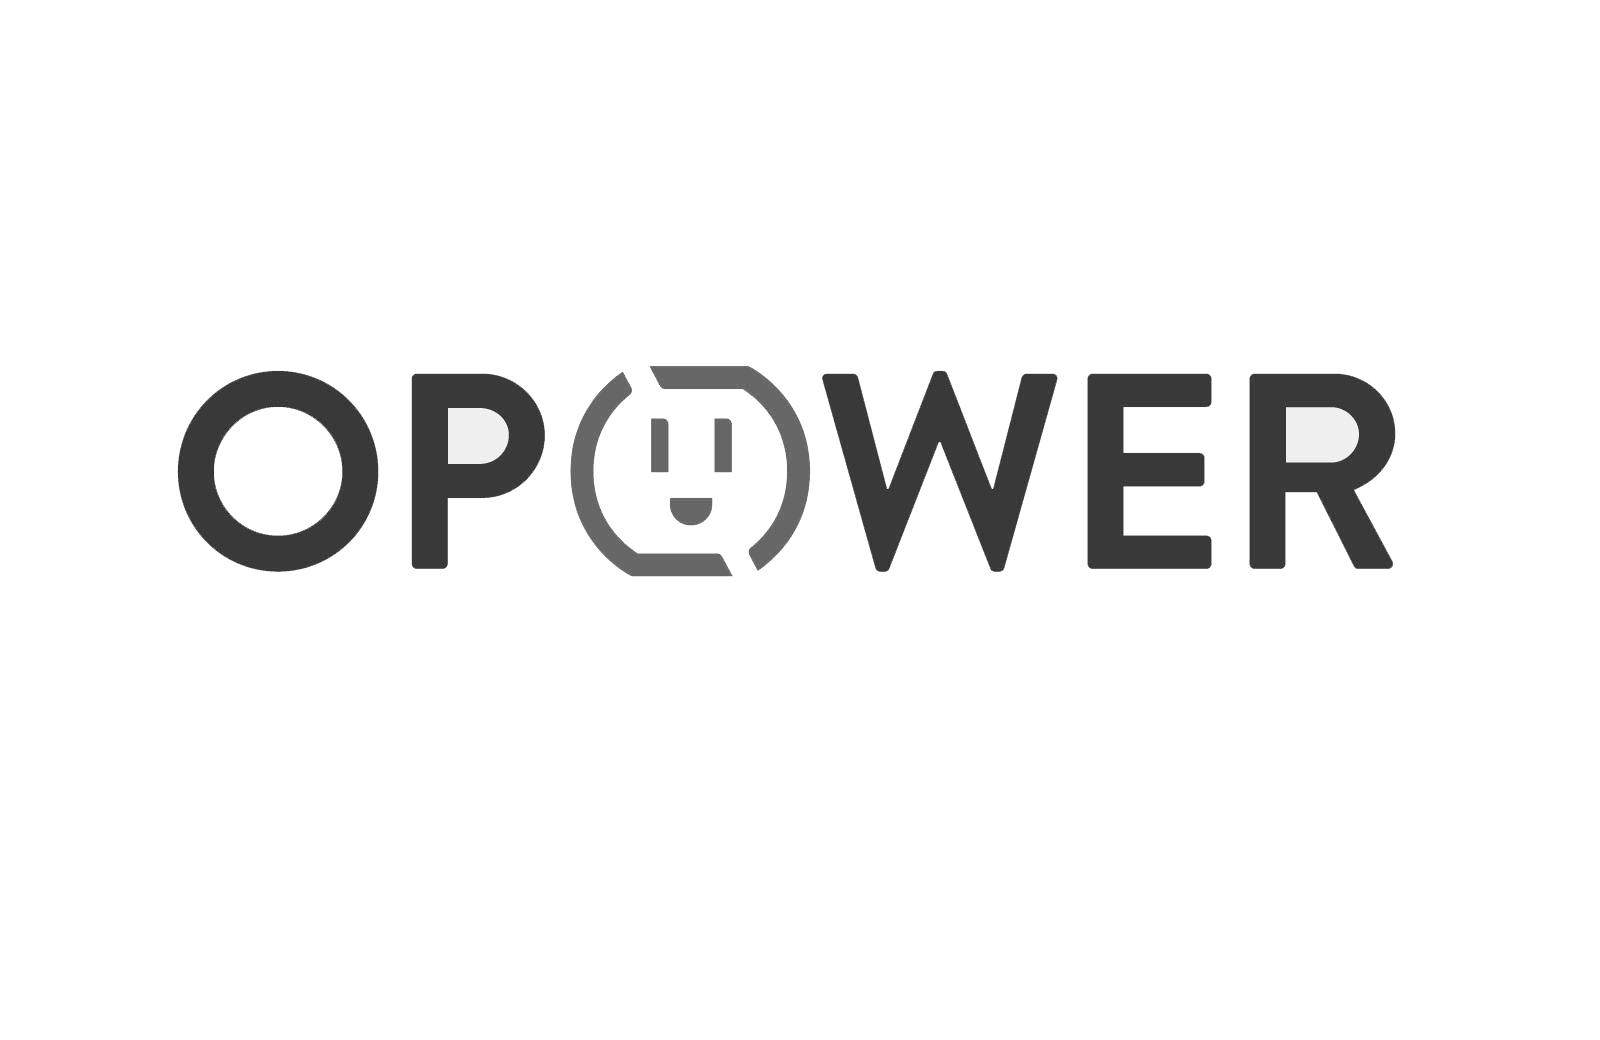 opower-logo1 - bw.jpg